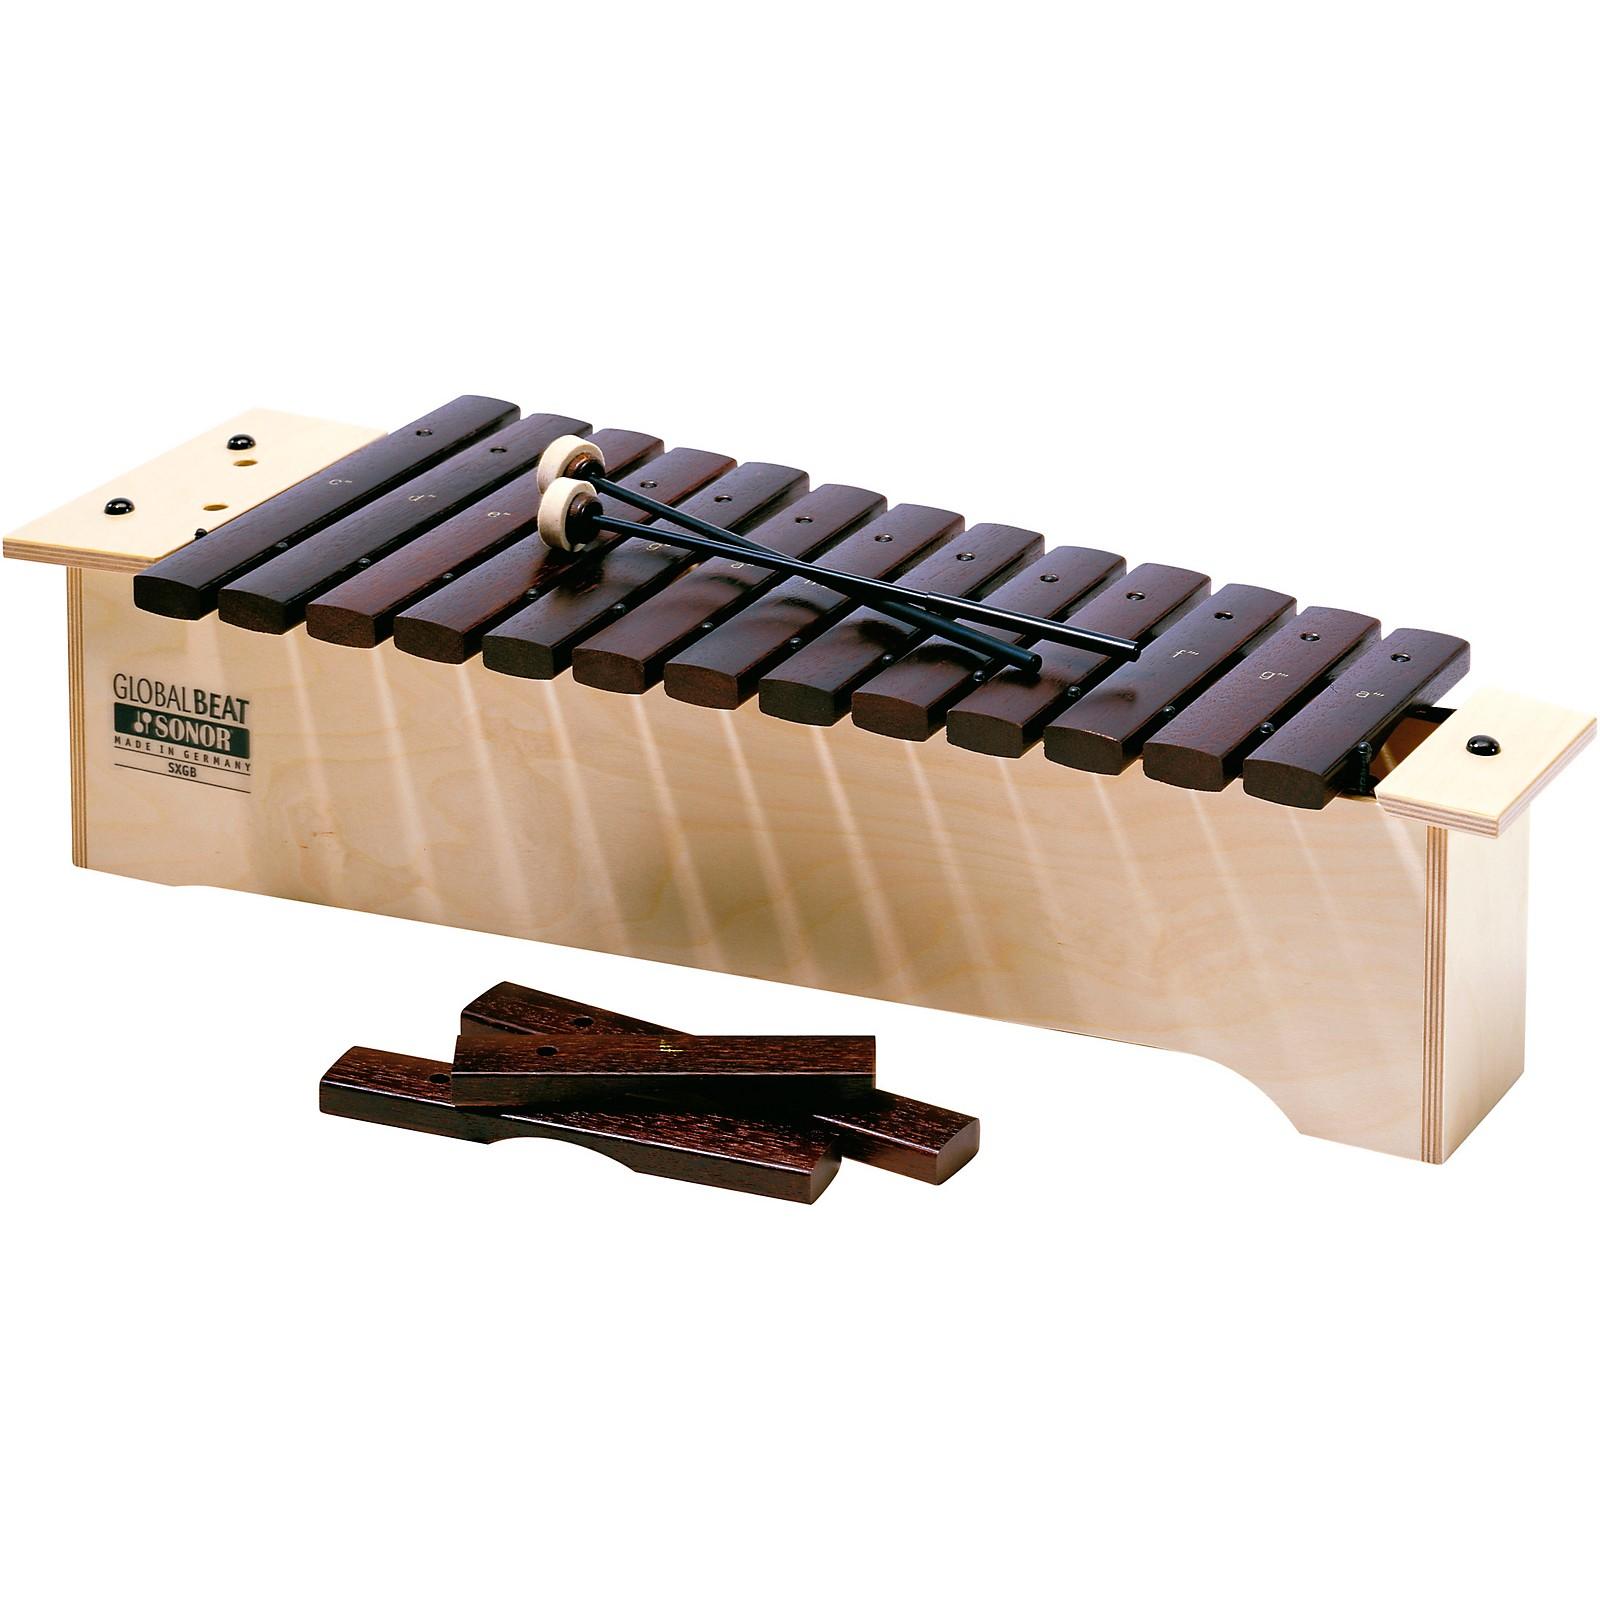 Open Box Sonor Orff Global Beat Xylophones